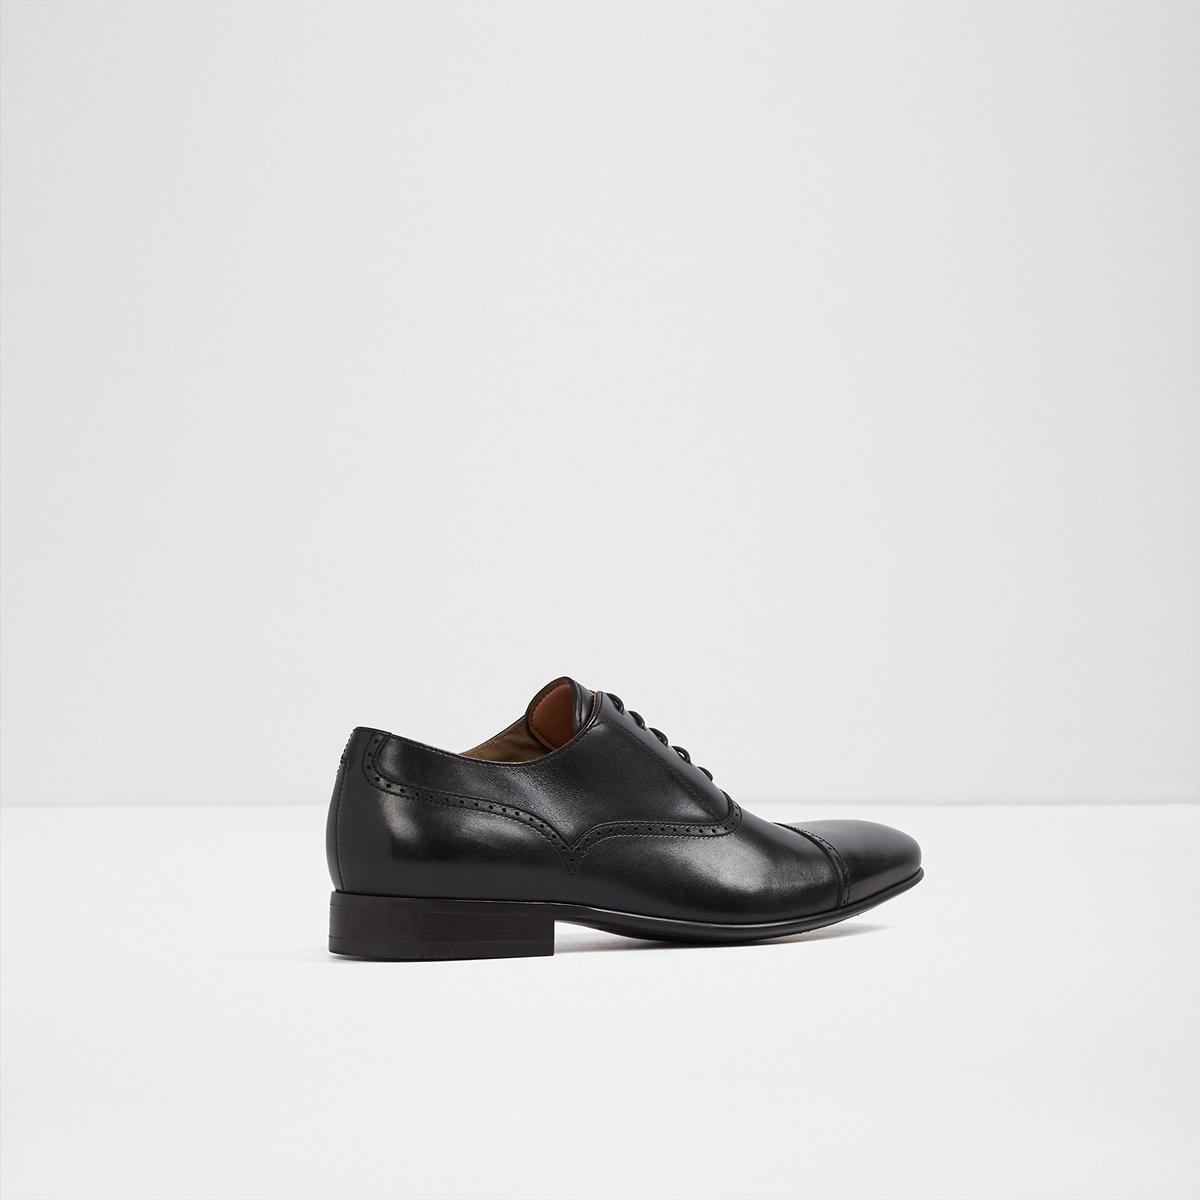 Aldo  Saylian Shoes  Black Leather